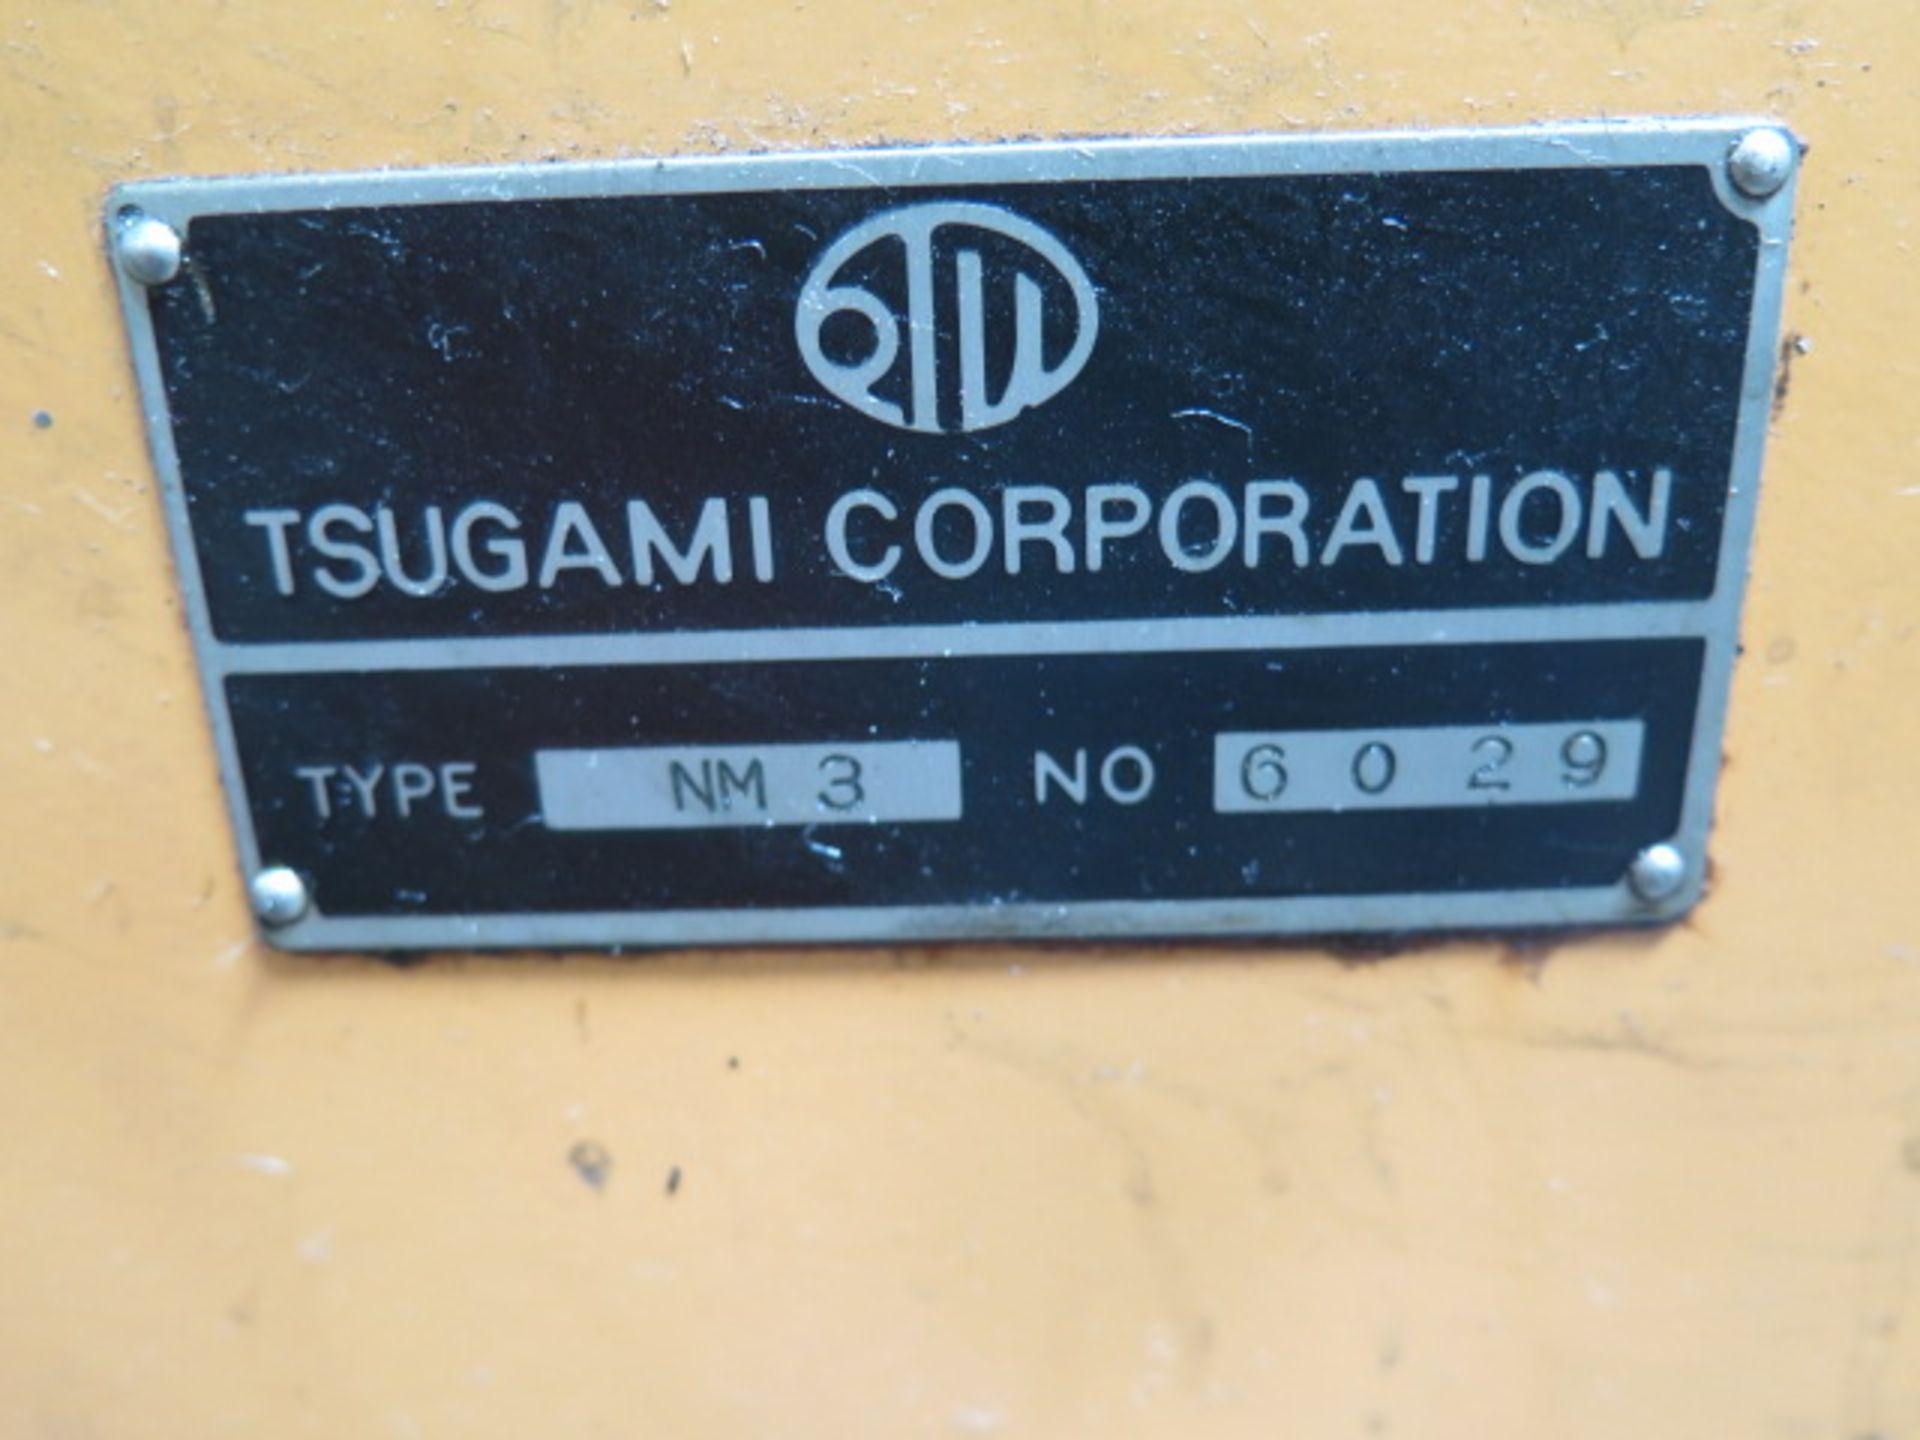 Tsugami NM3 CNC Turning Center s/n 6029 w/ Mitsubishi Meldas Controls, 8-Station Turret, SOLD AS IS - Image 16 of 16